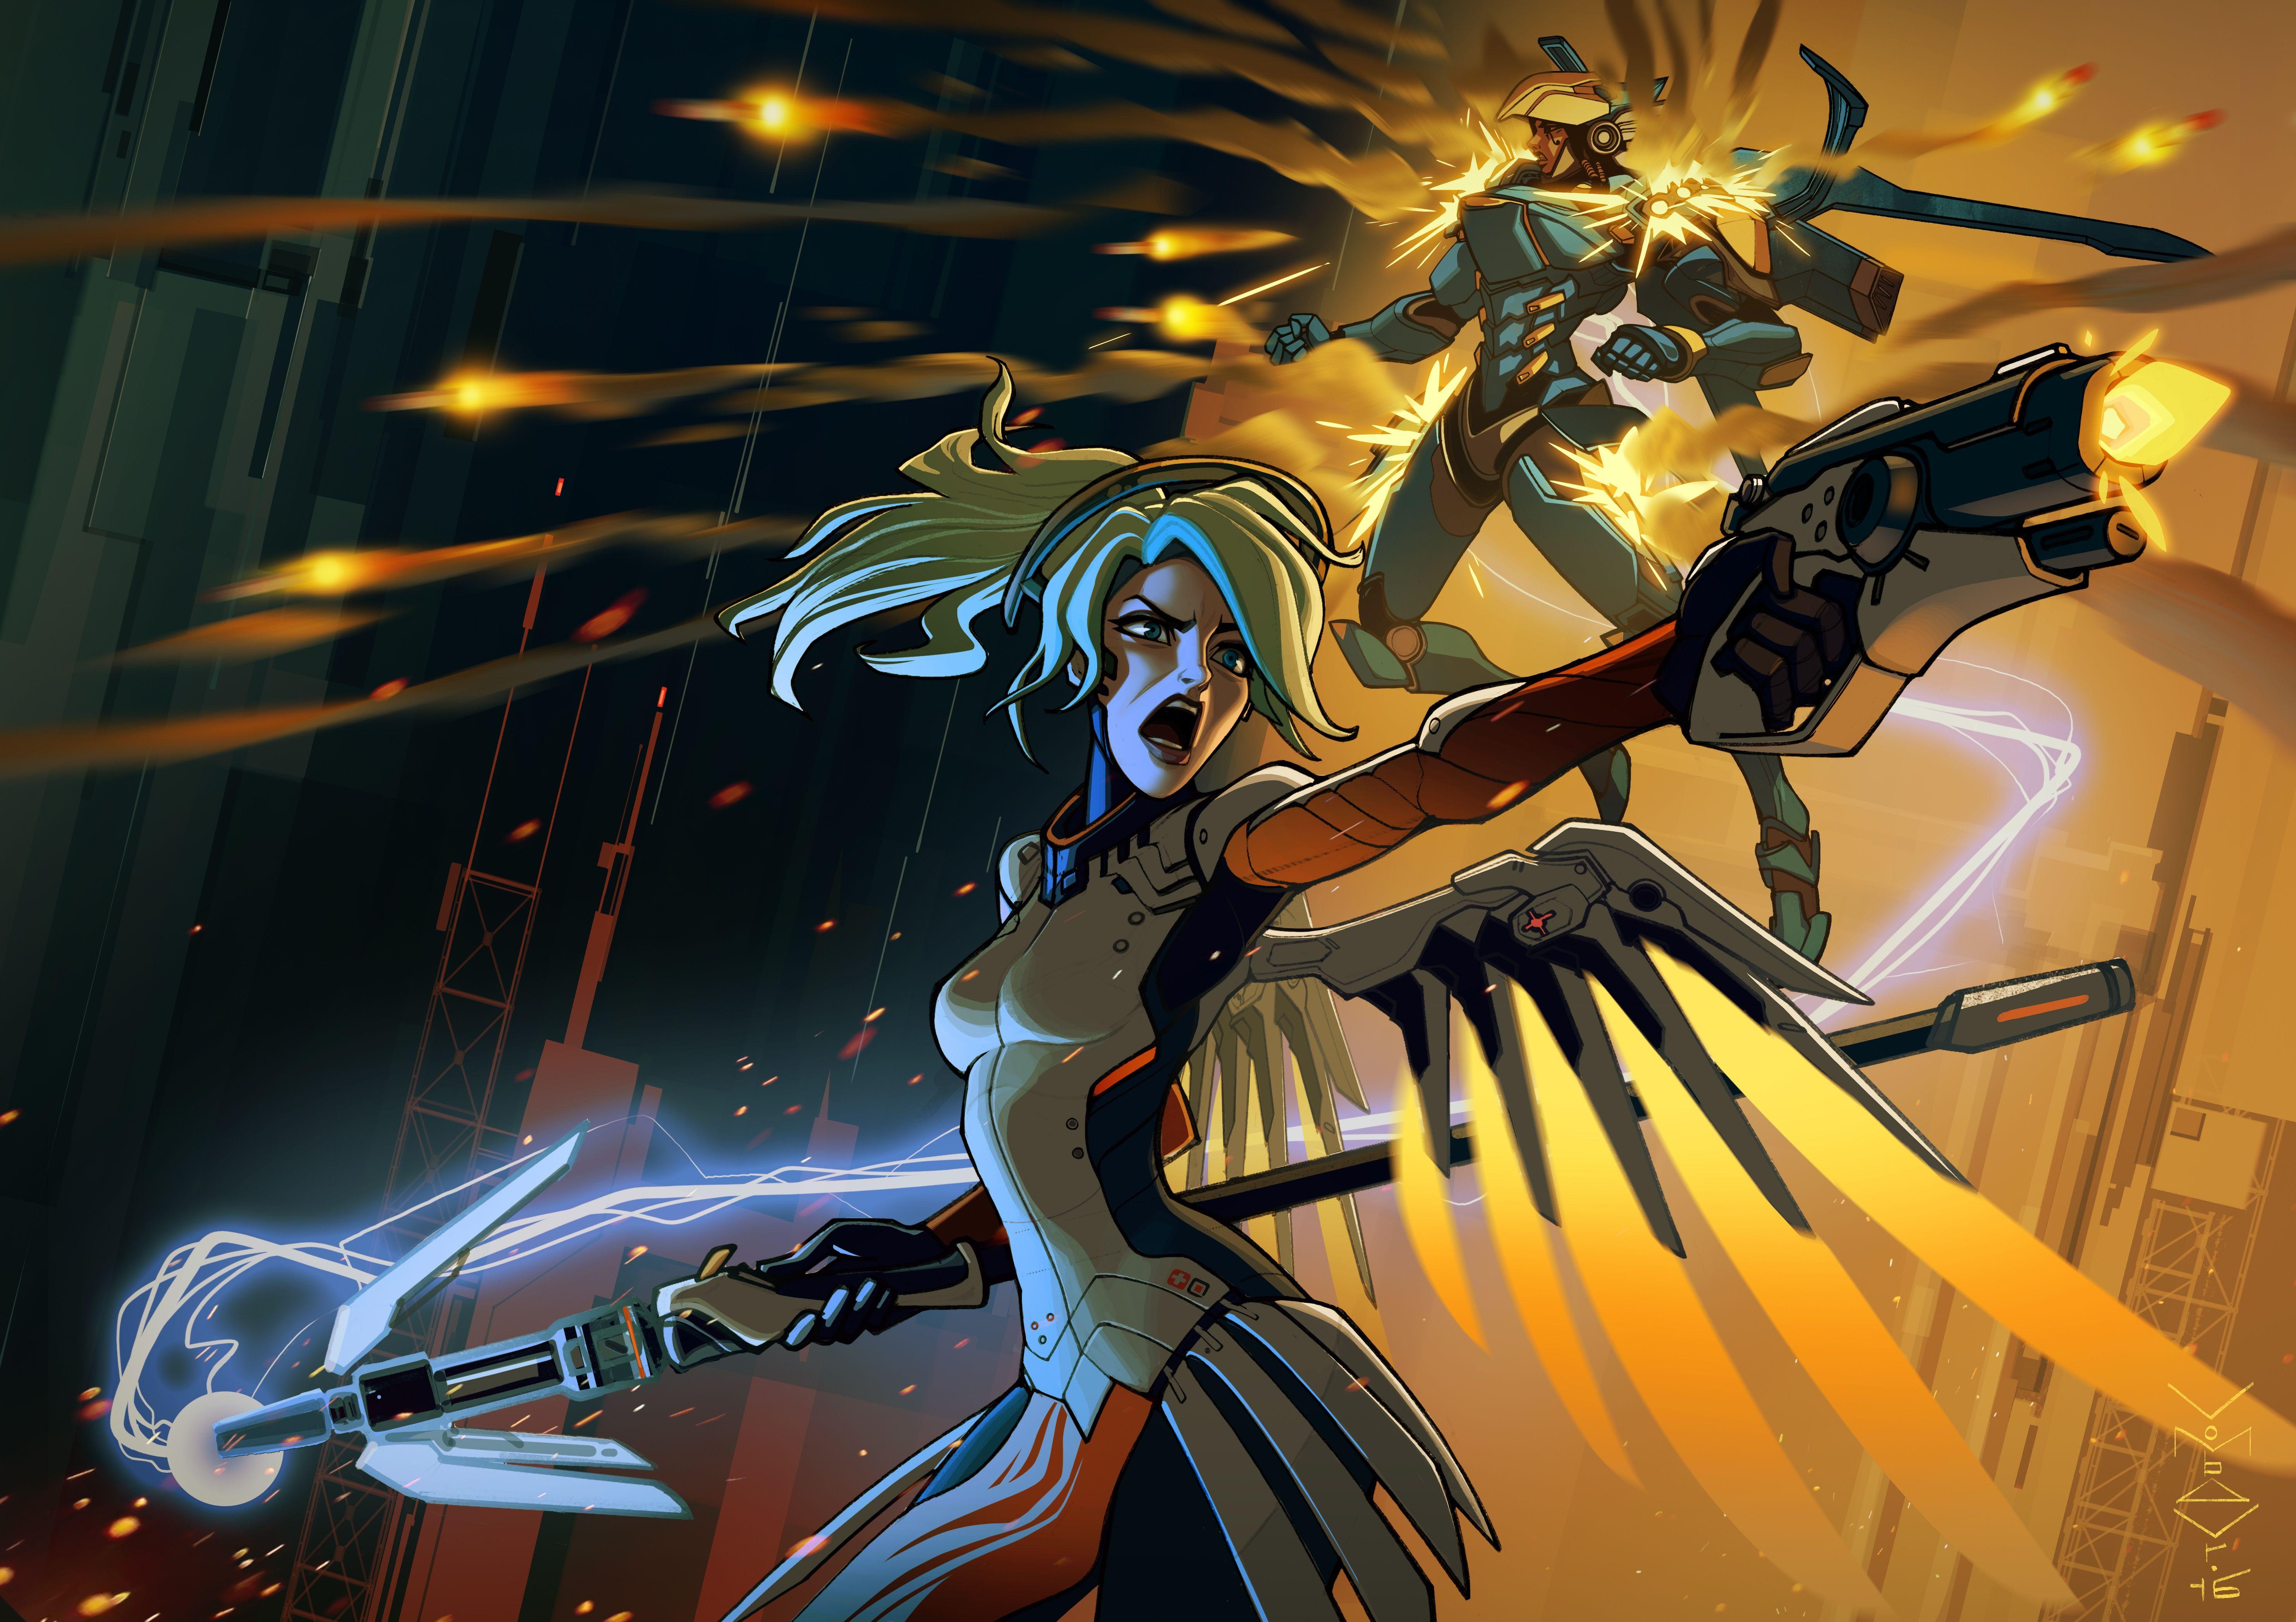 Mercy Overwatch HD Wallpapers Backgrounds Wallpaper